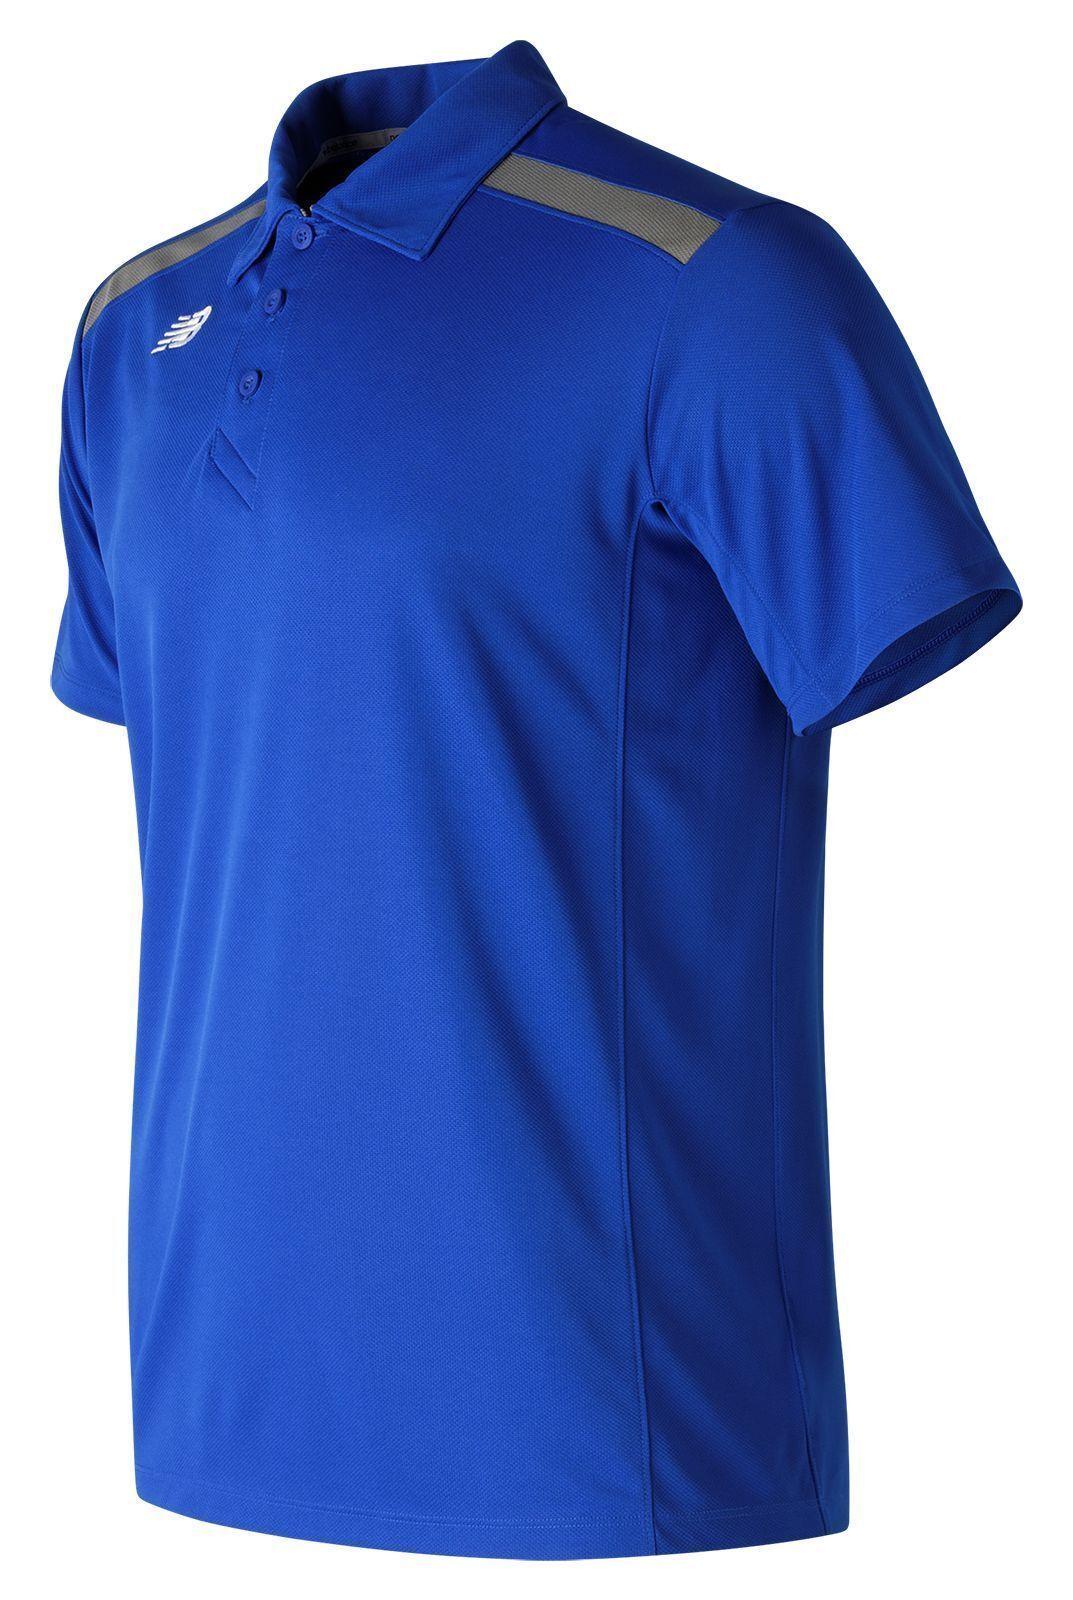 New Balance 5112 Mens bluee Baseball Polo Size Small